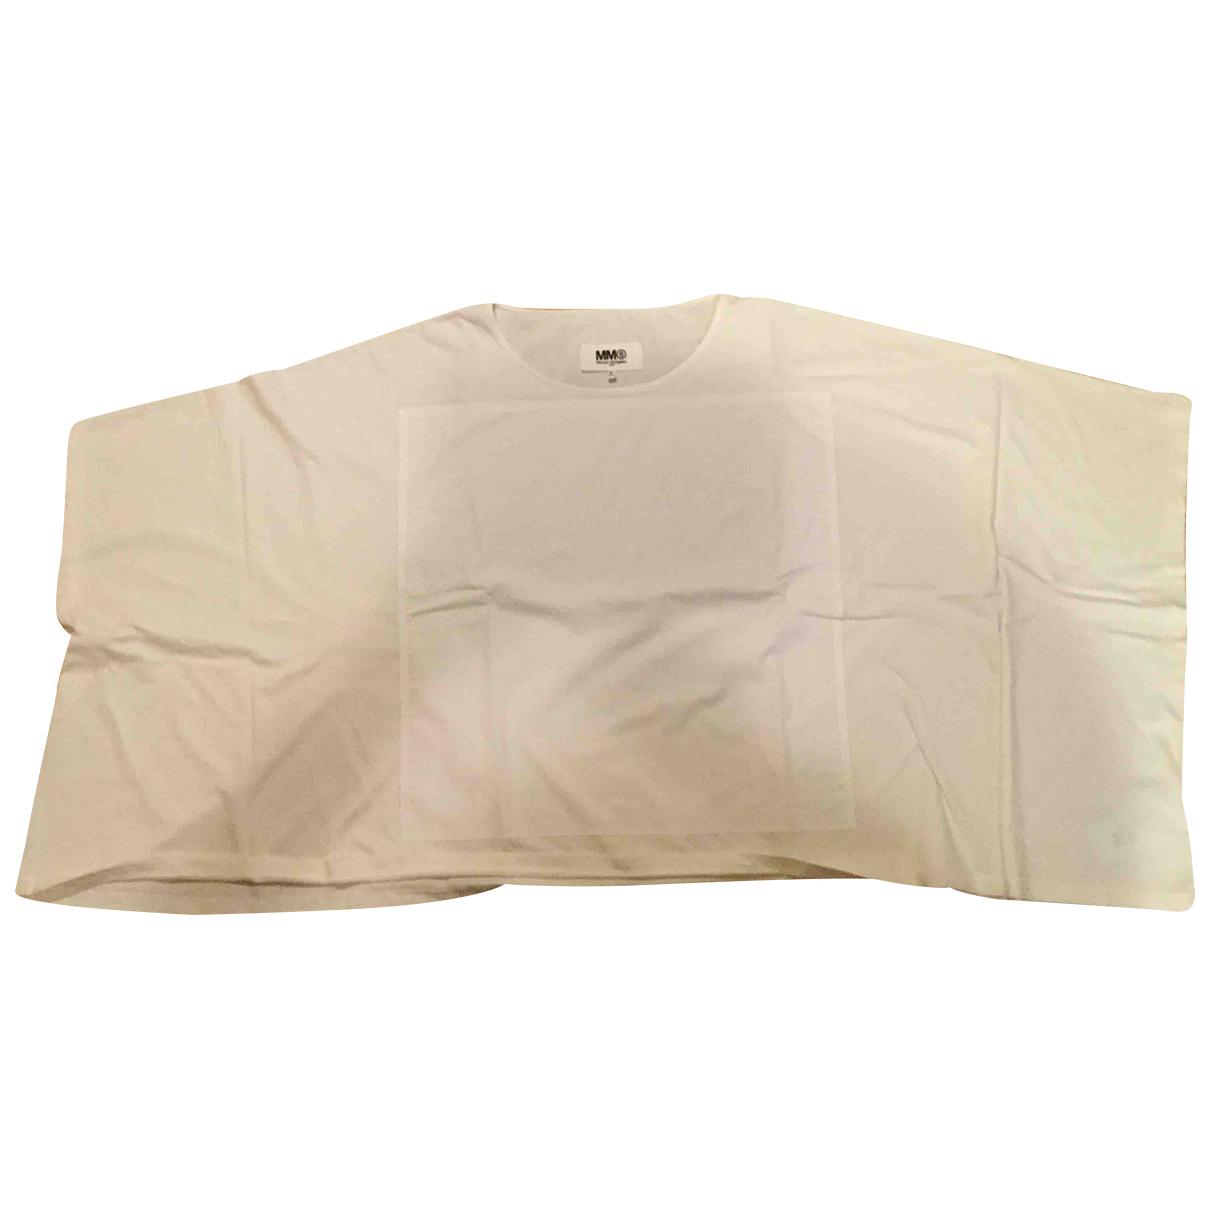 Maison Martin Margiela N White Cotton Knitwear for Women 44 IT